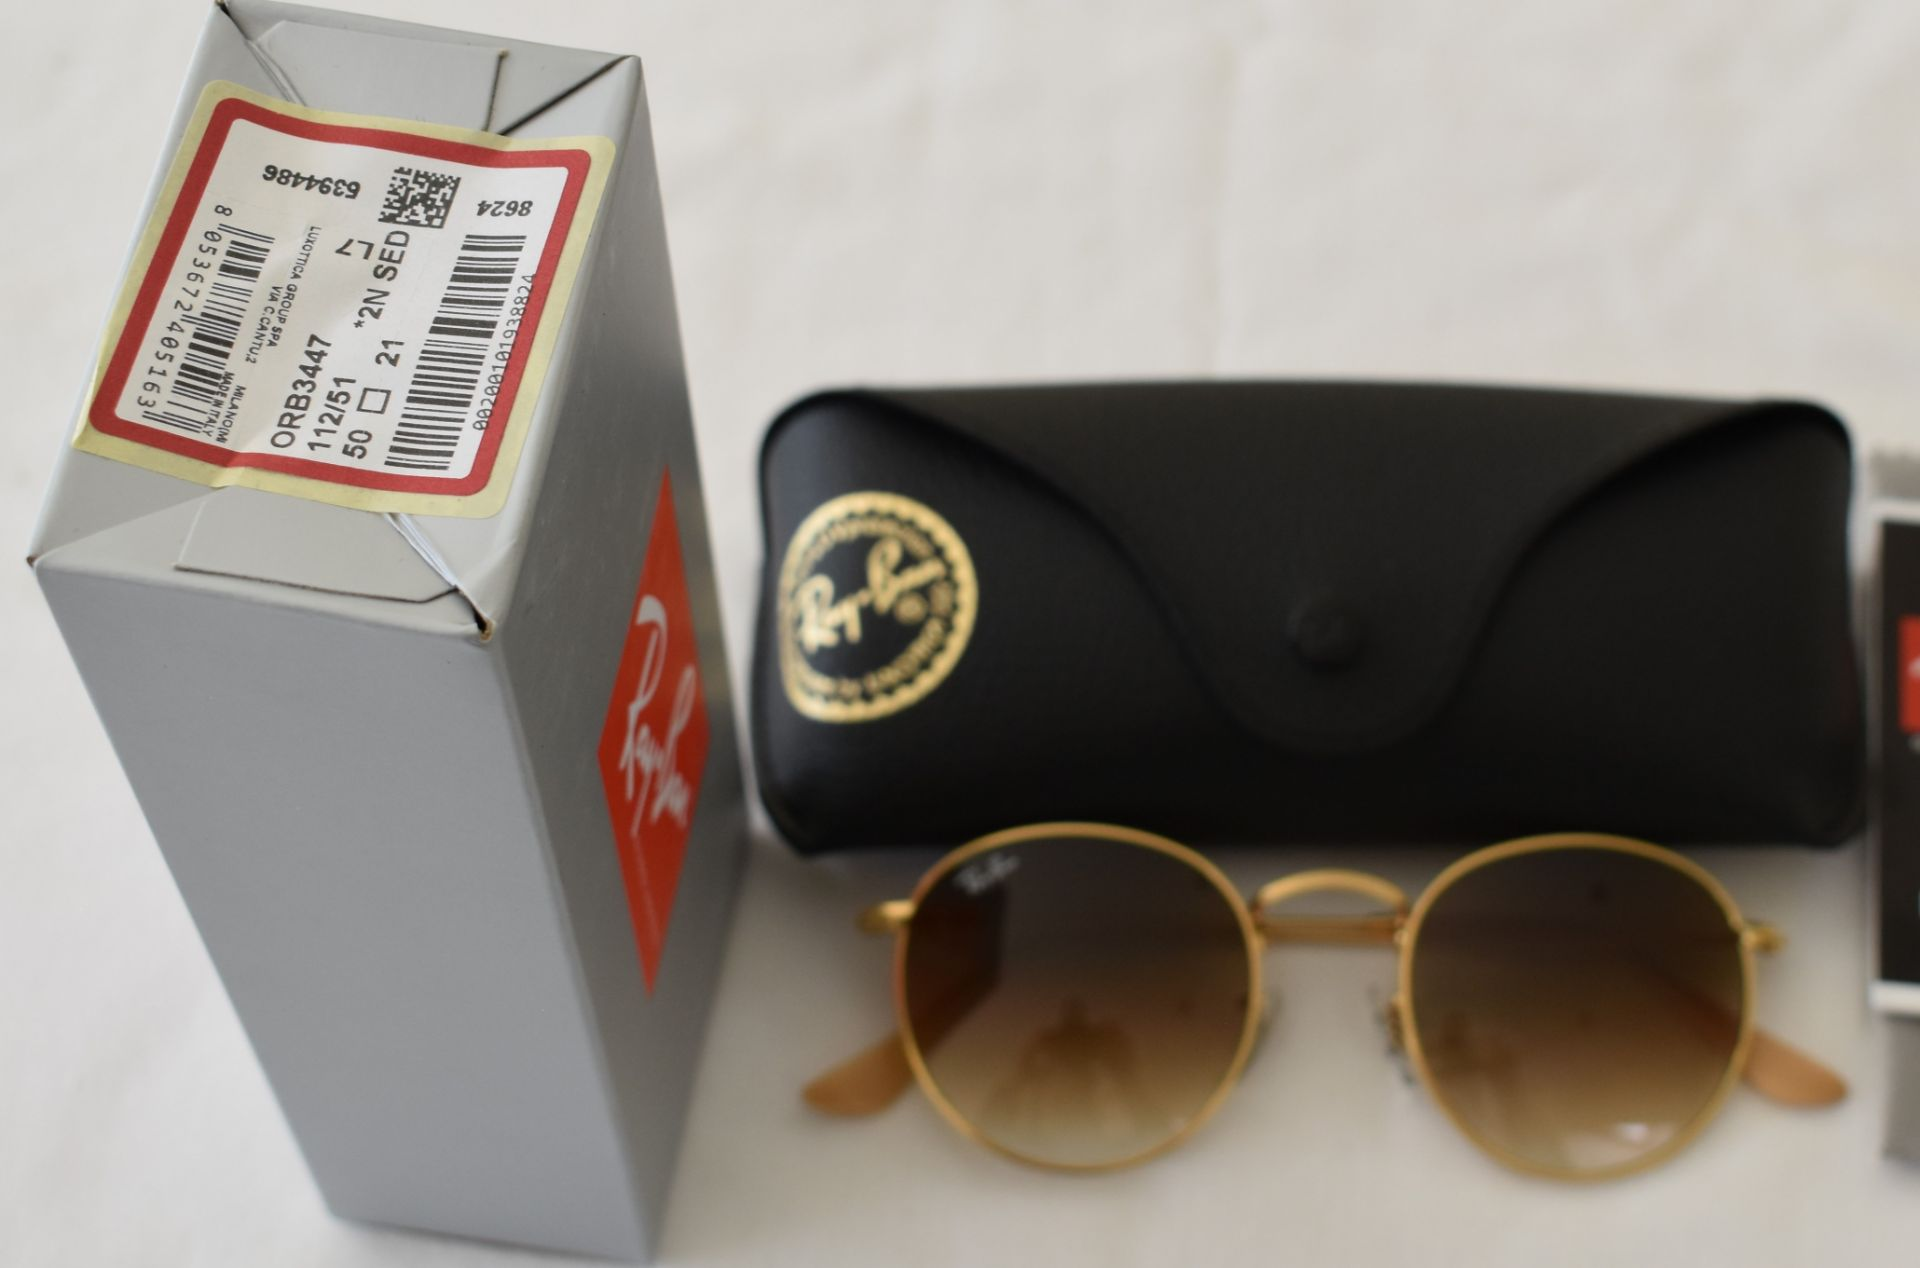 Ray Ban Sunglasses ORB3447 112/51 *2N - Image 2 of 2